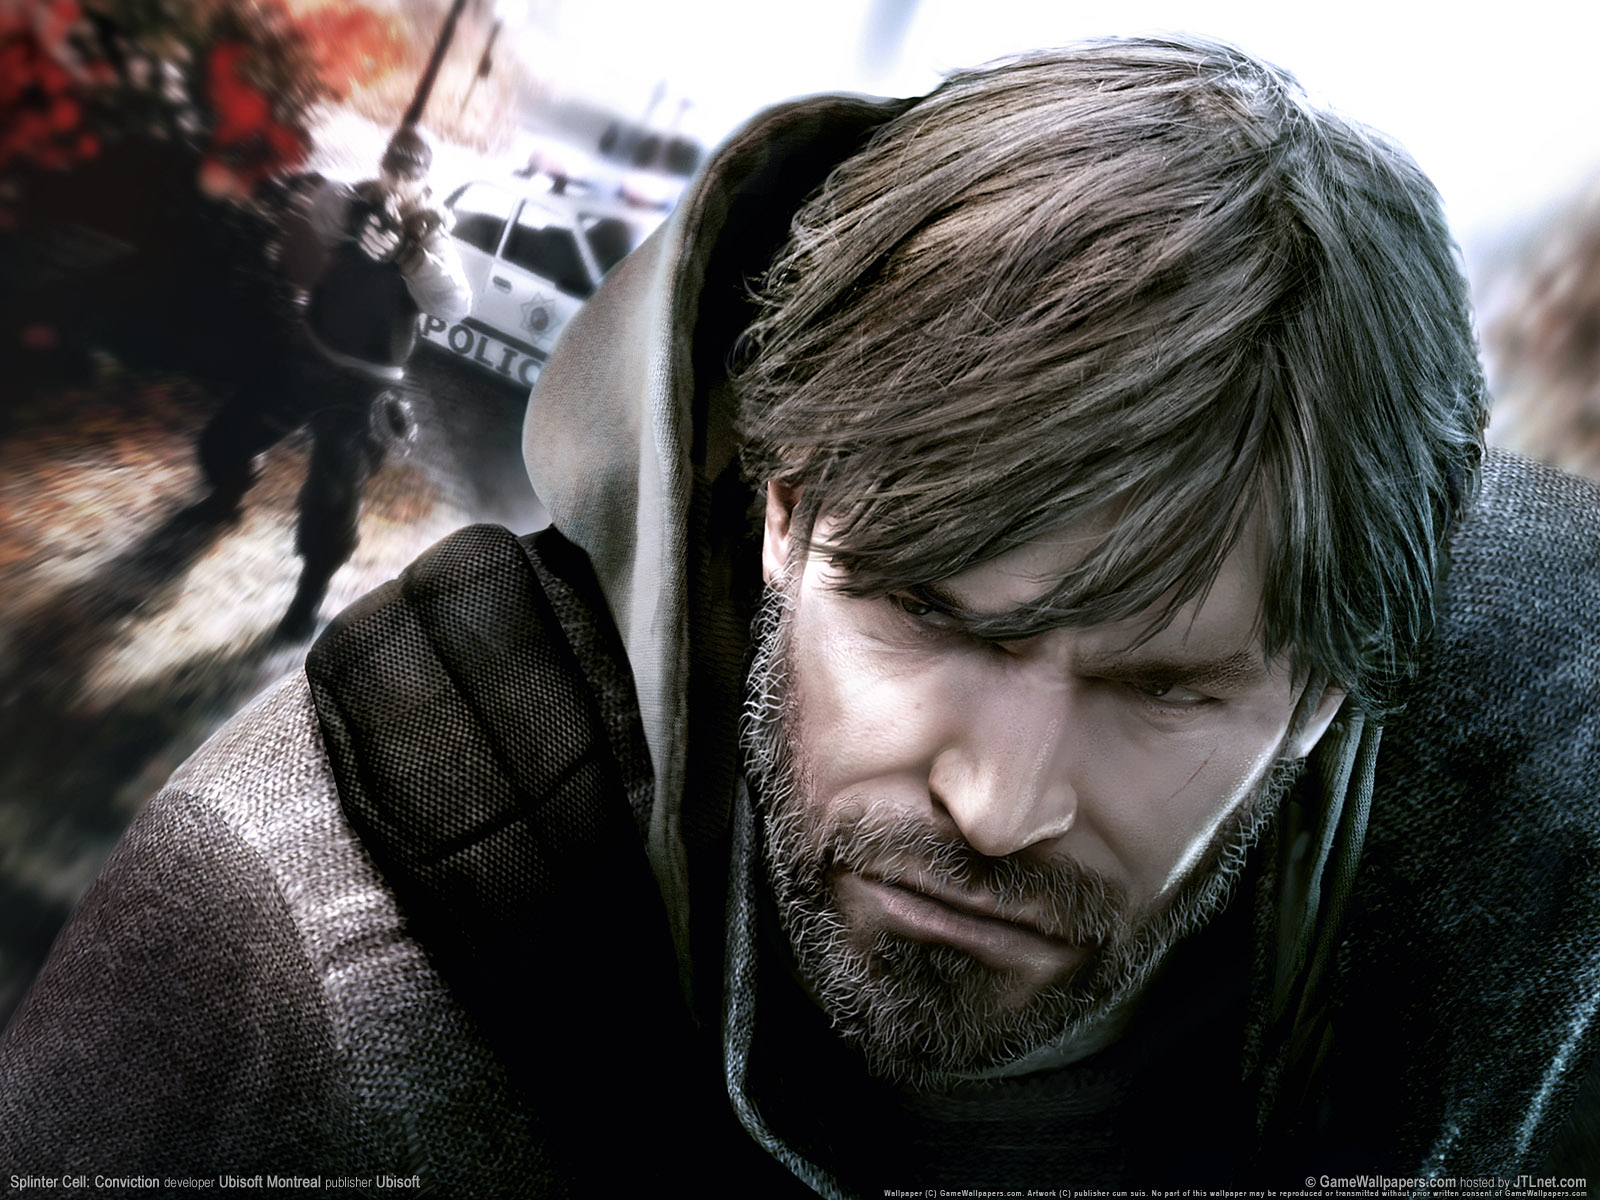 dos jogos Tom Clancy's Splinter Cell, Tom Clancy's Splinter Cell